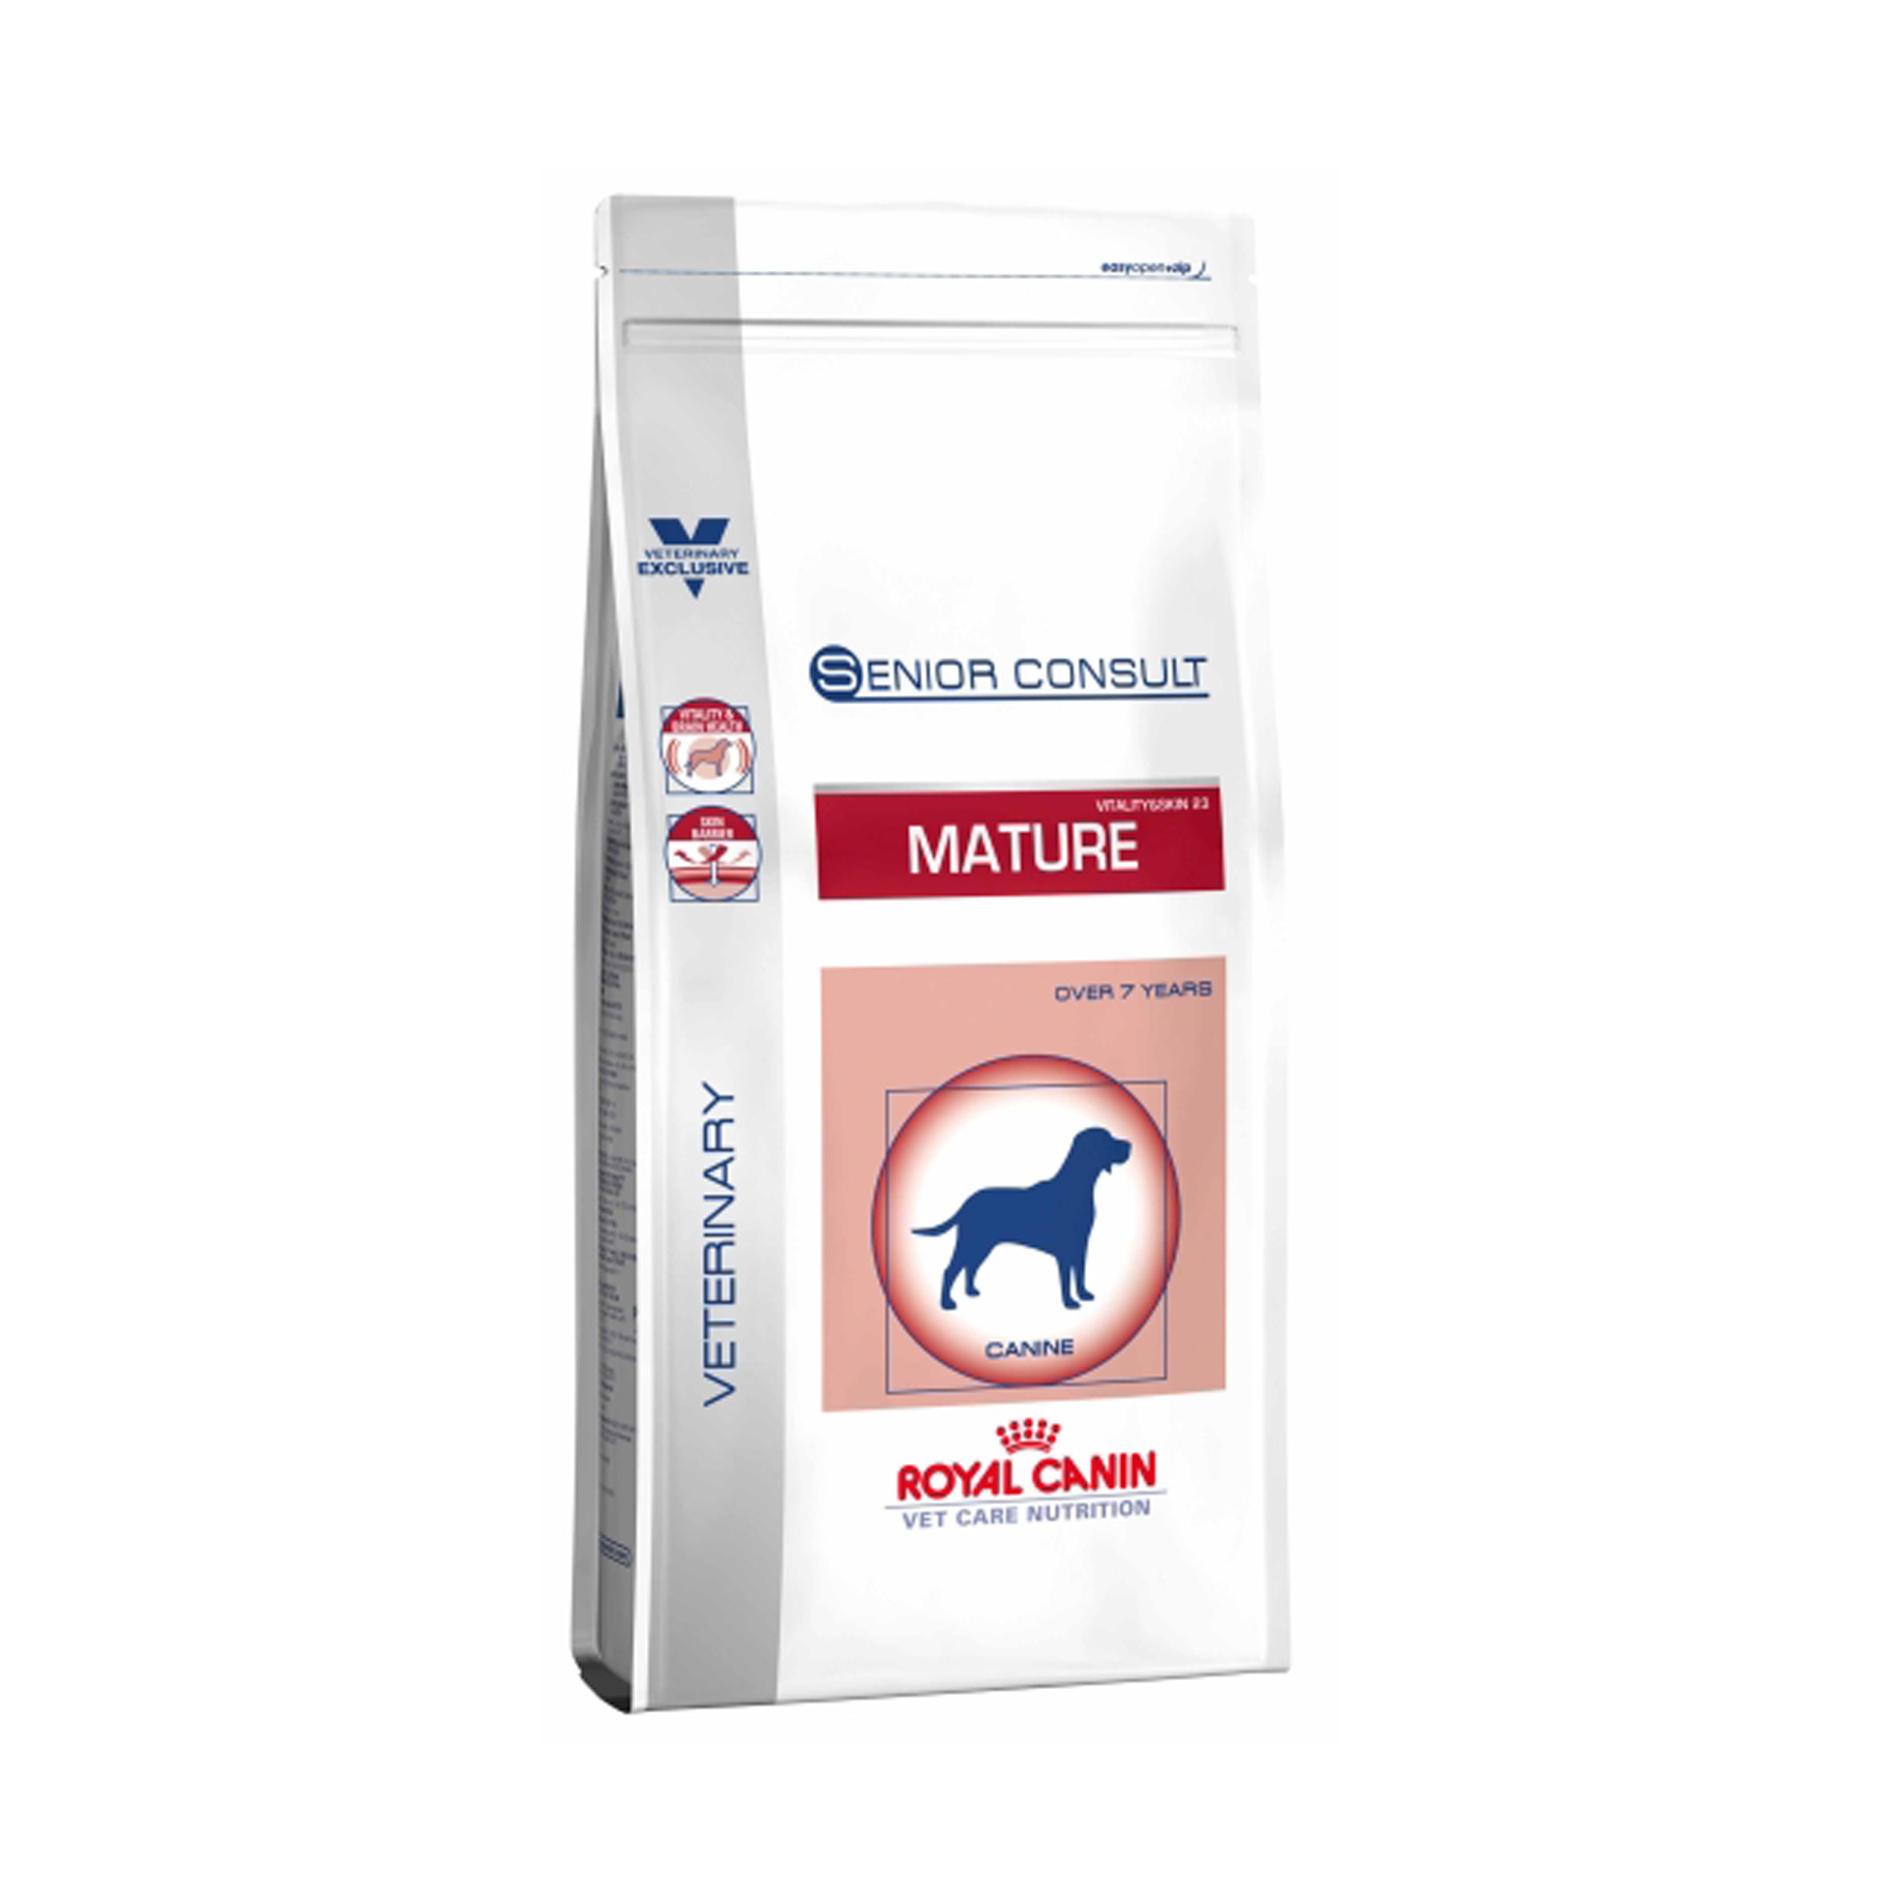 Royal Canin Canine Veterinary Care Nutrition Senior Consult Mature Medium Dog